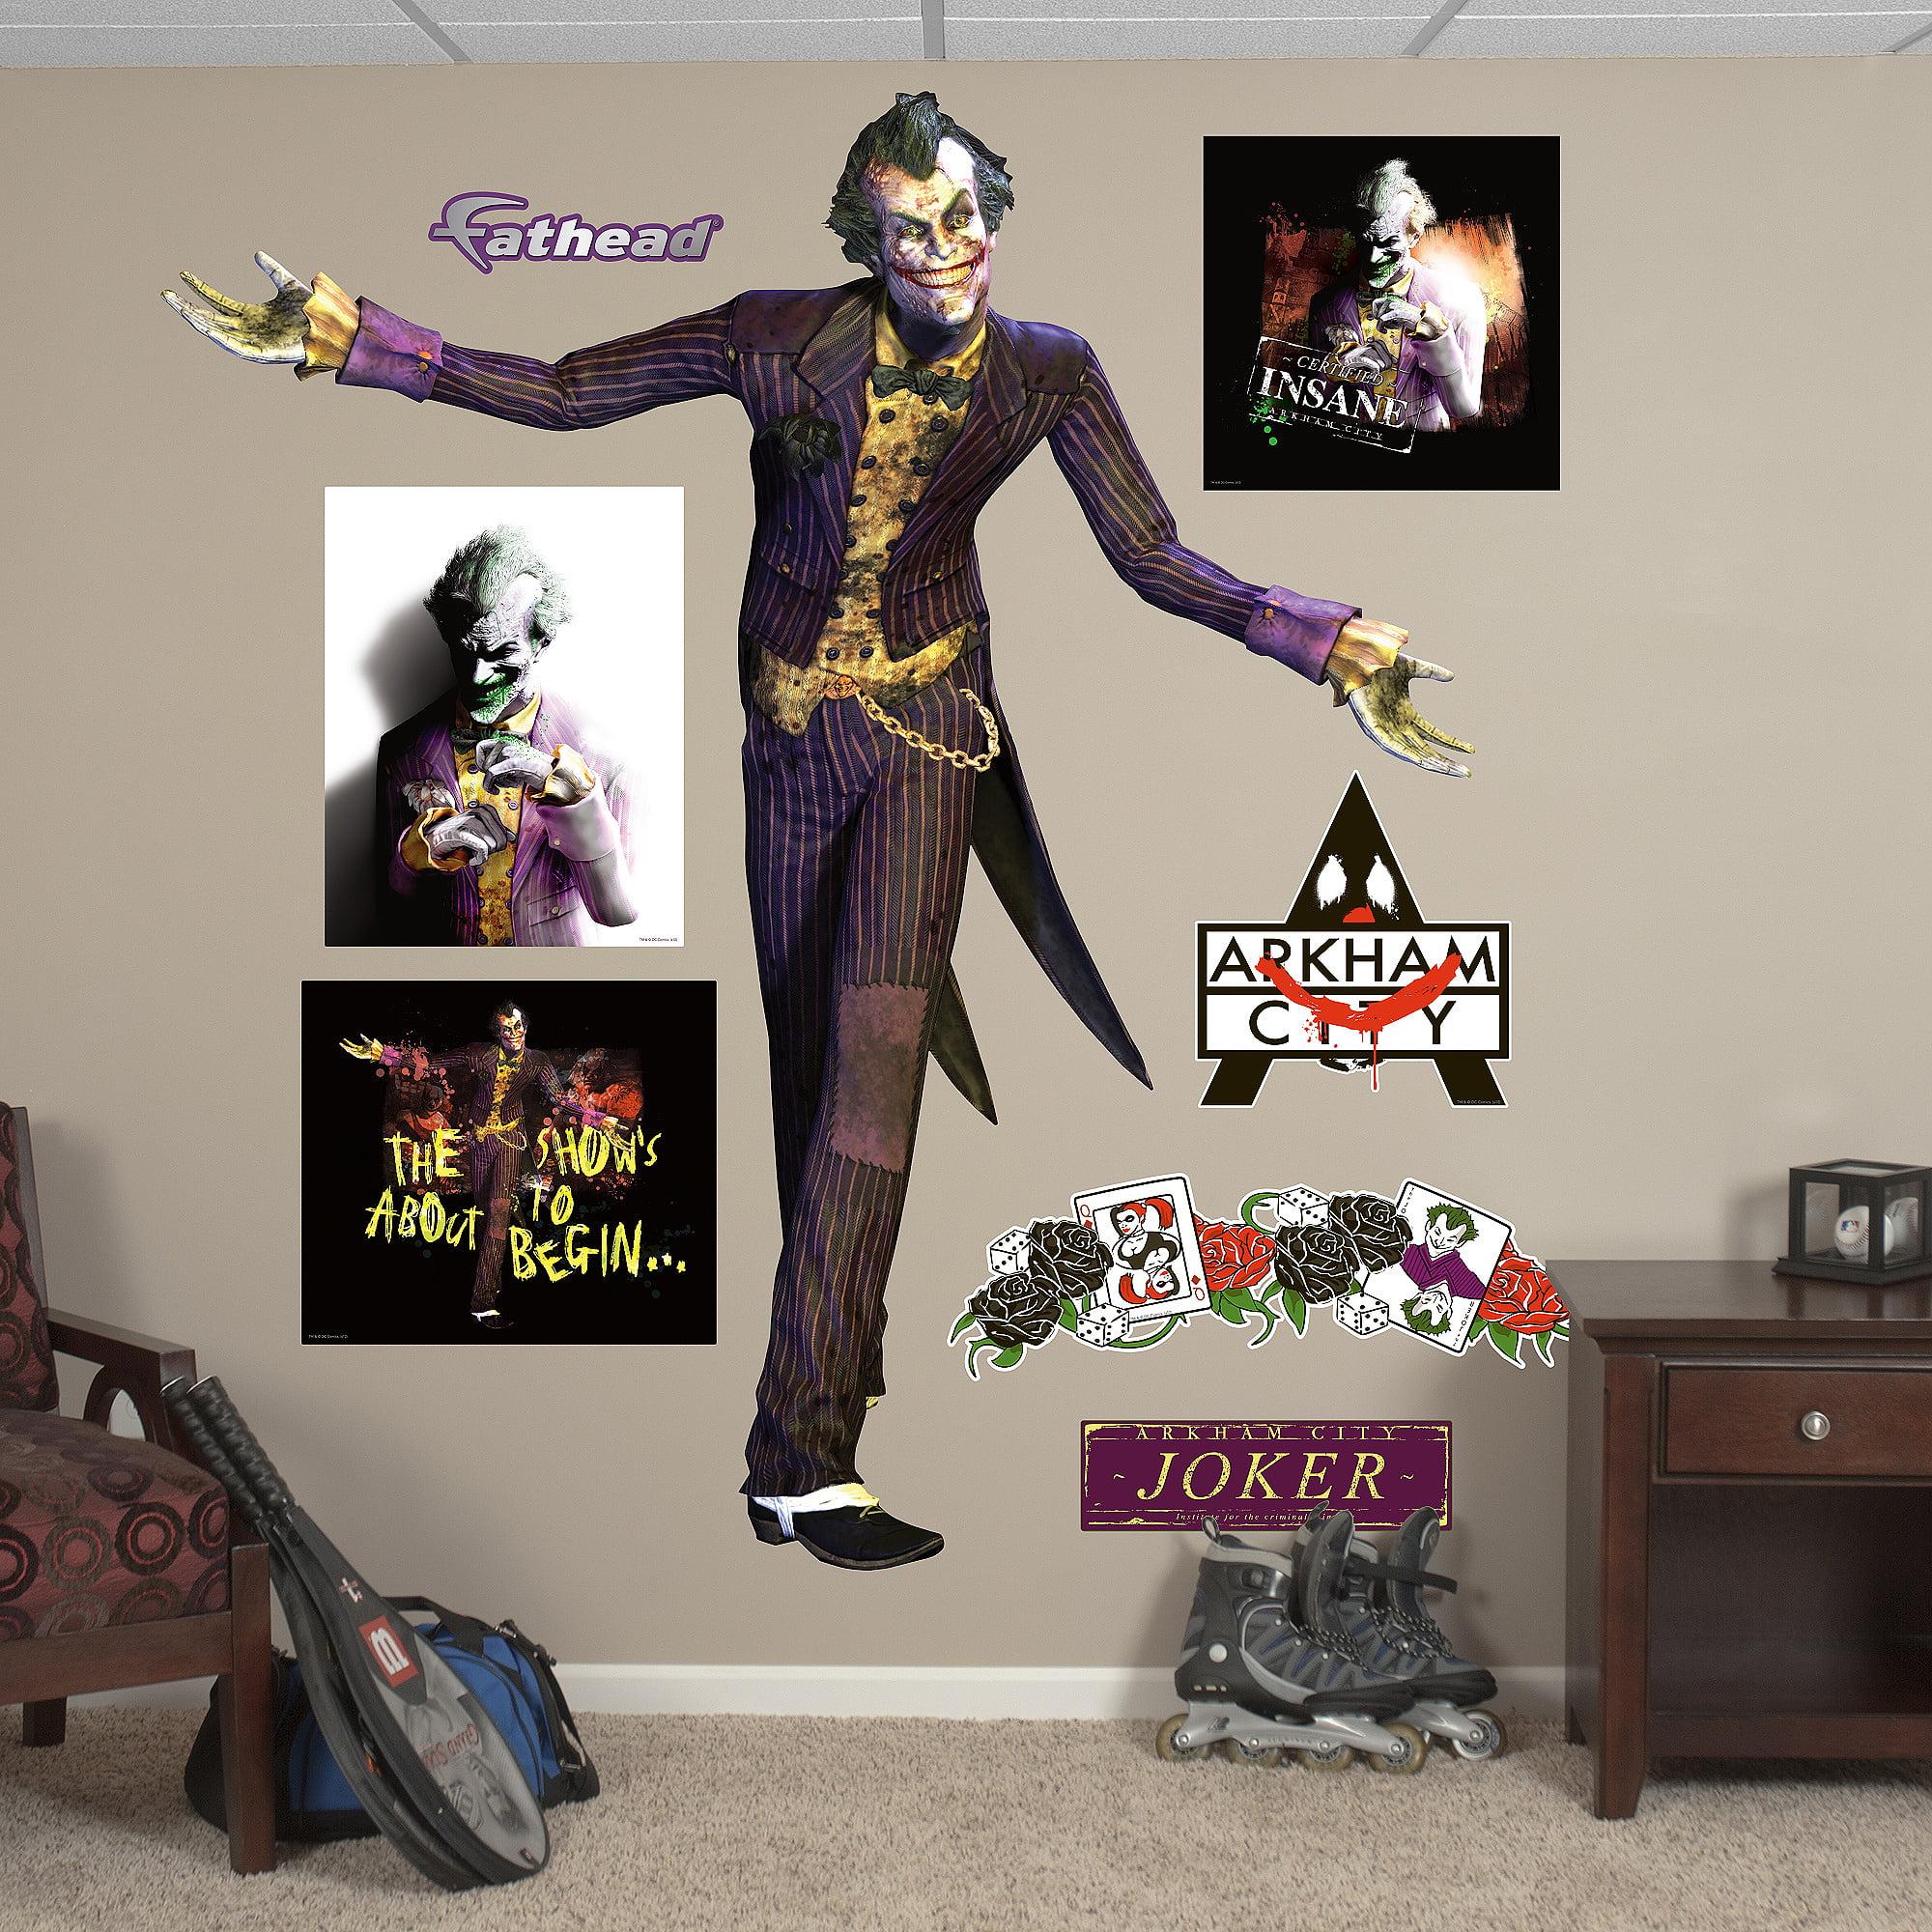 Joker Arkham City Fathead